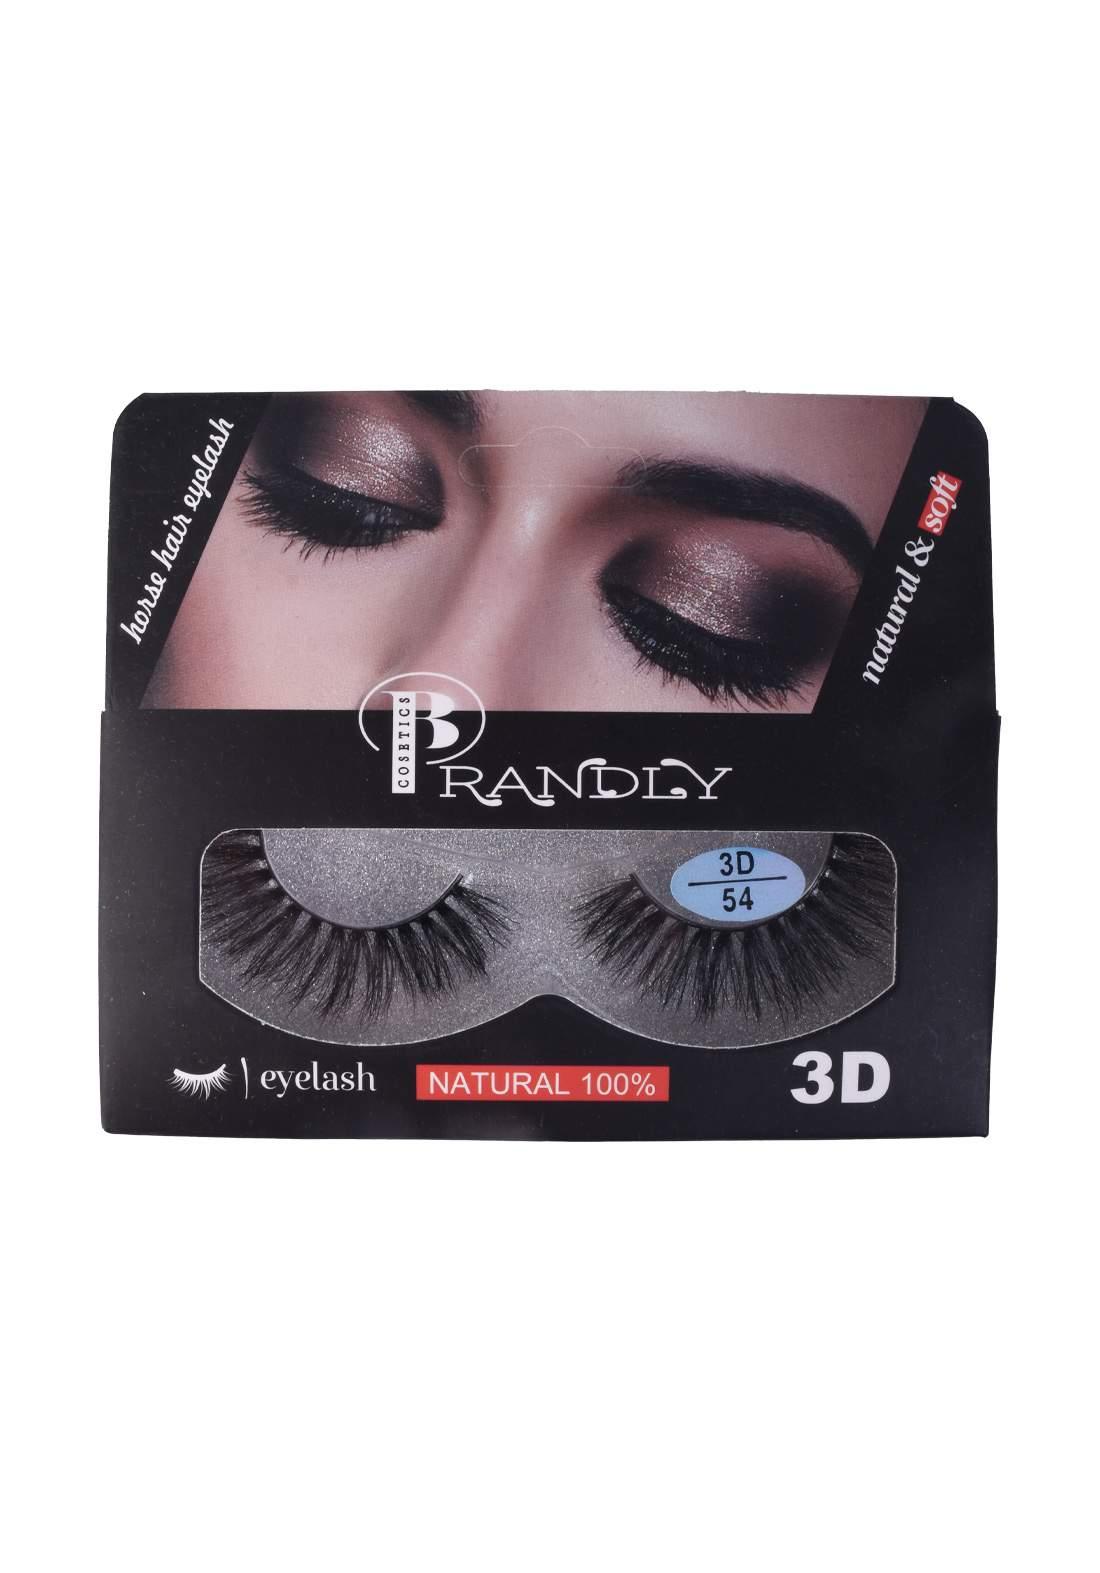 Brandly Cosmetics 3D no.54 False Eyelashes رموش صناعية